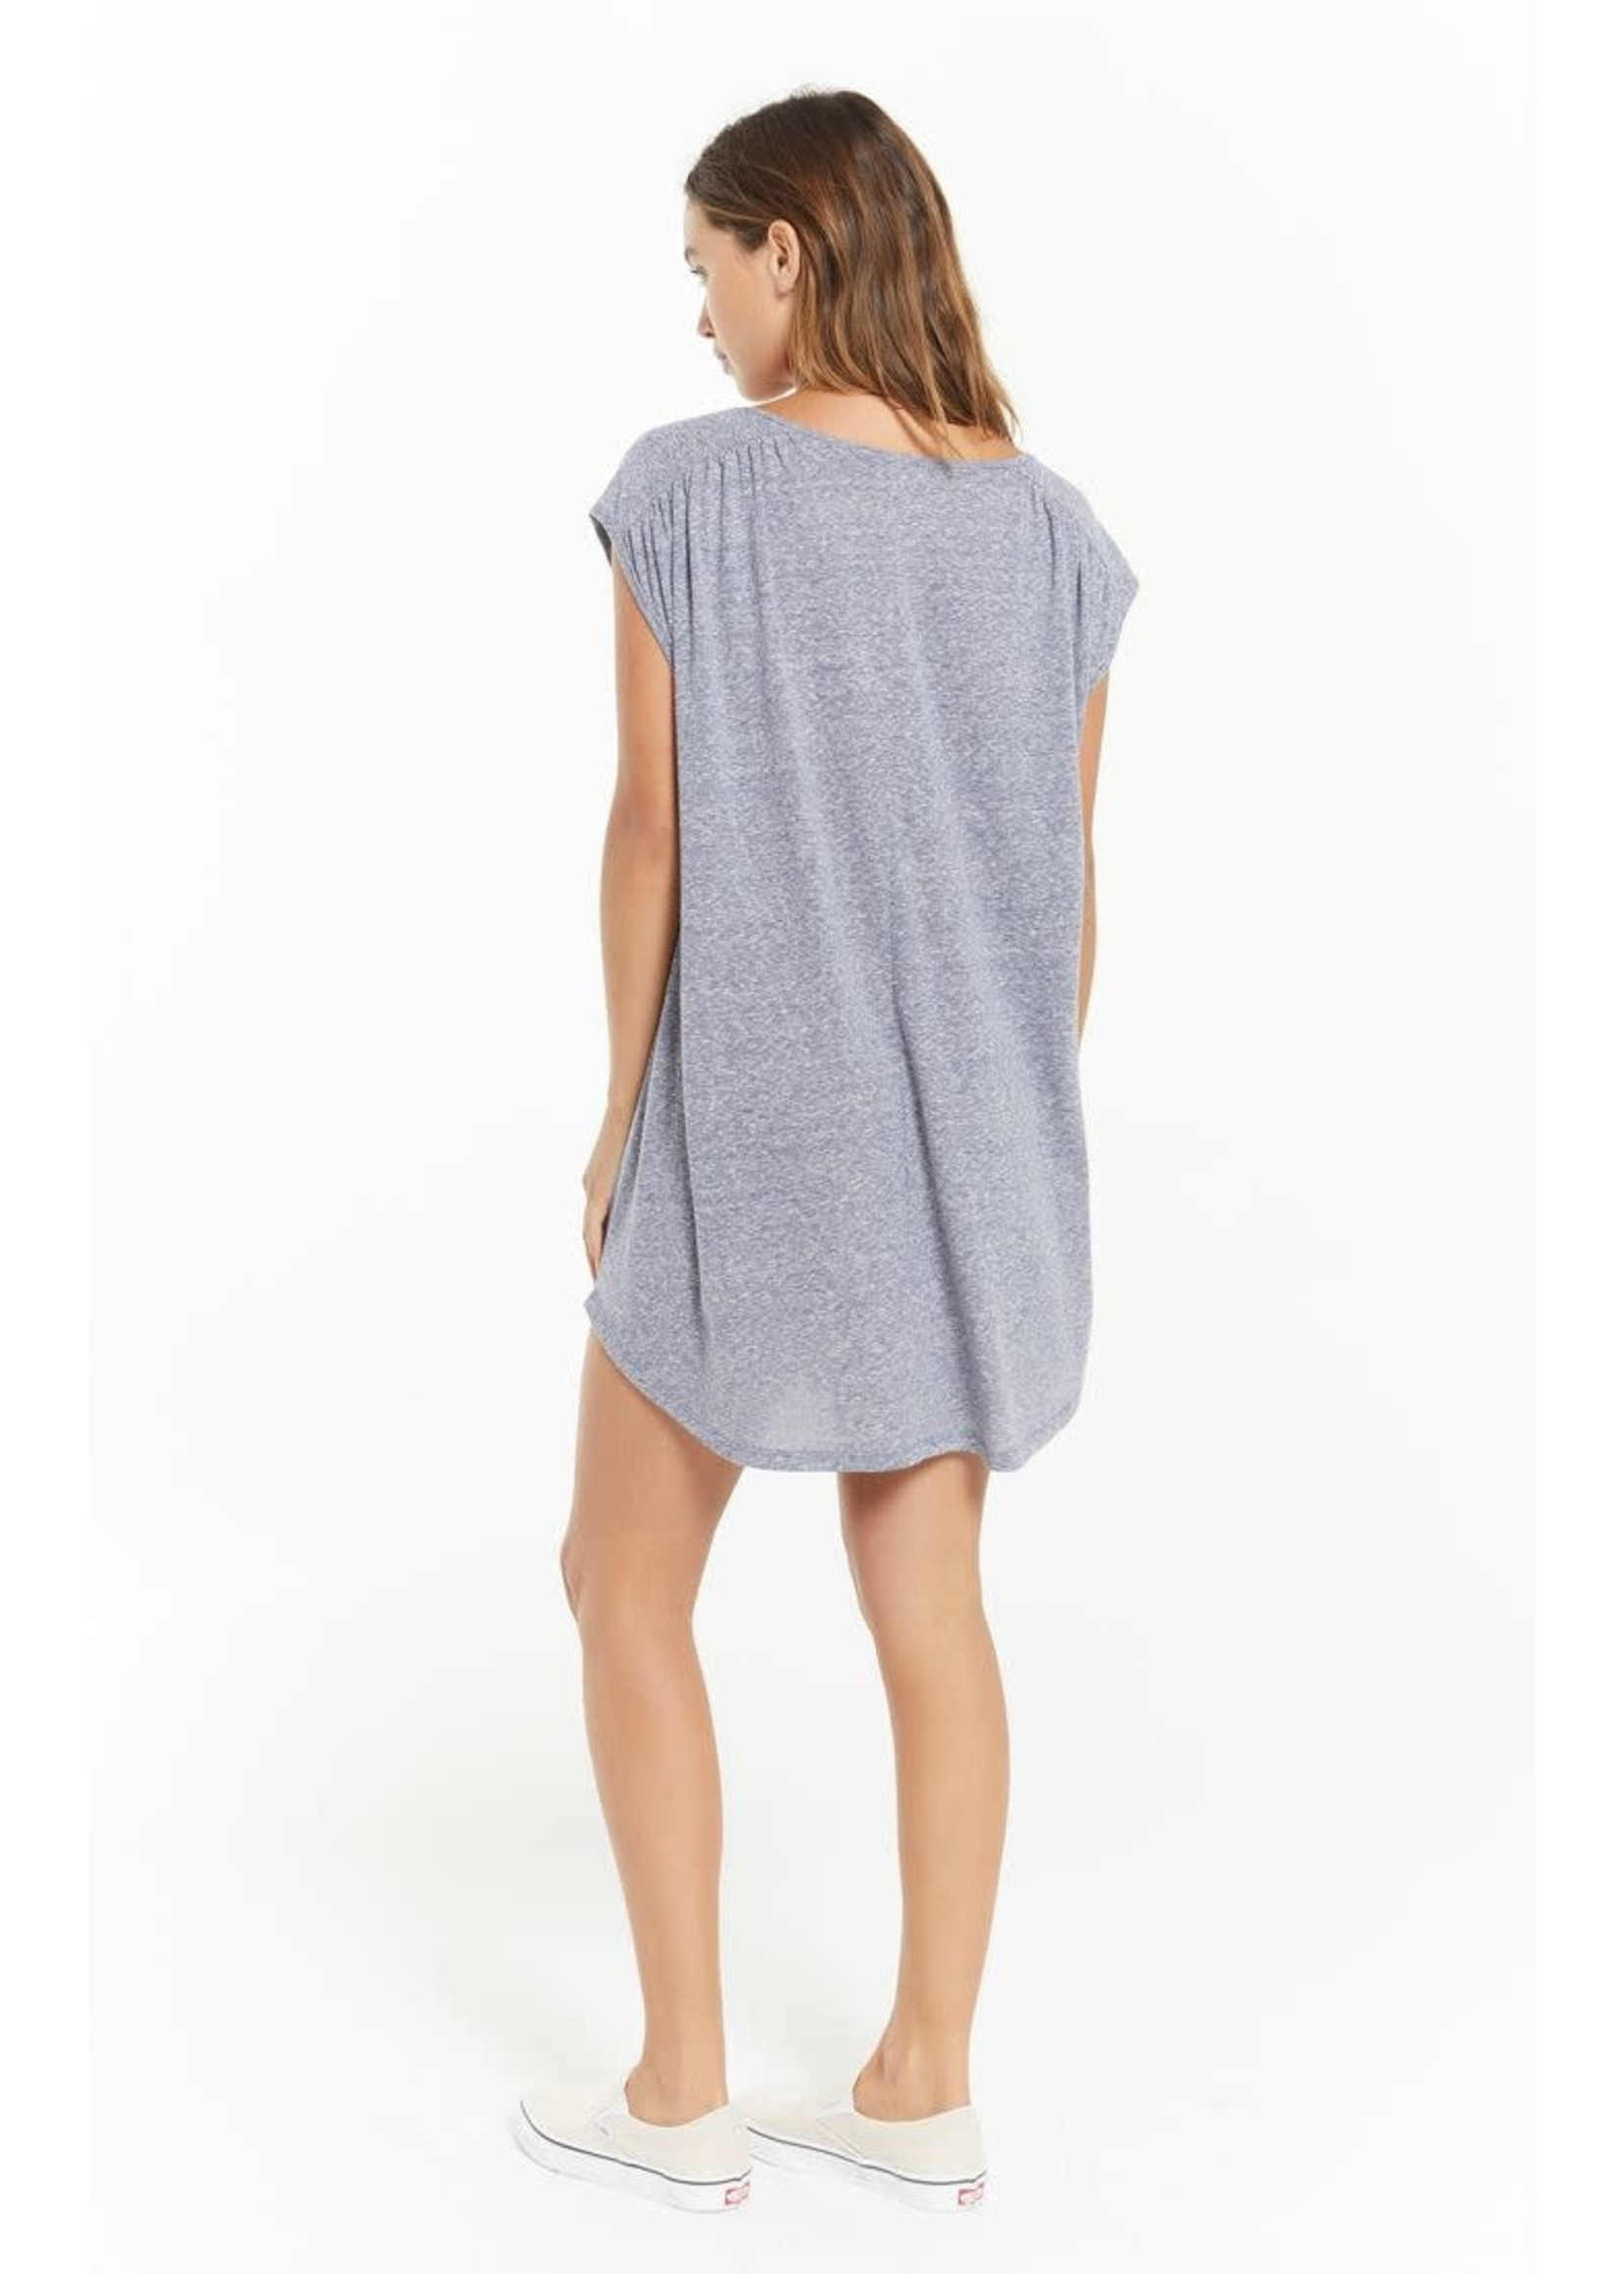 Z Supply Avery Tri Blend Mini Dress - ZD213131